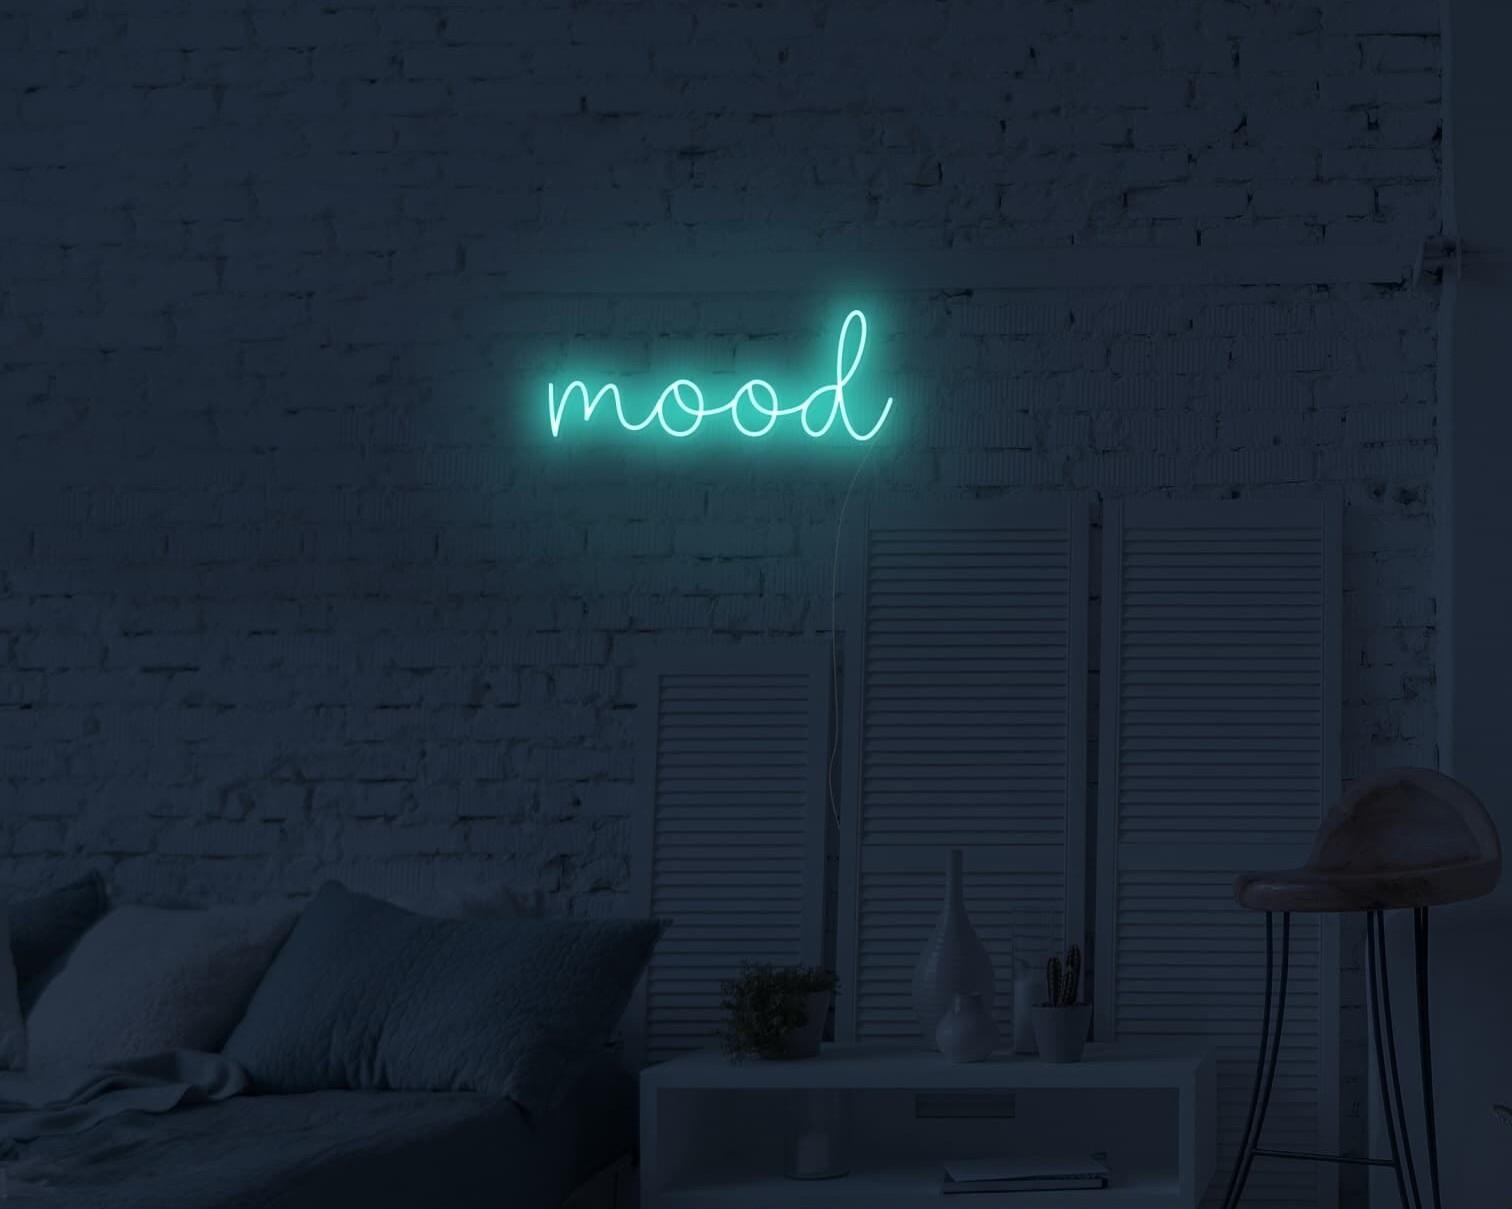 mood neon light